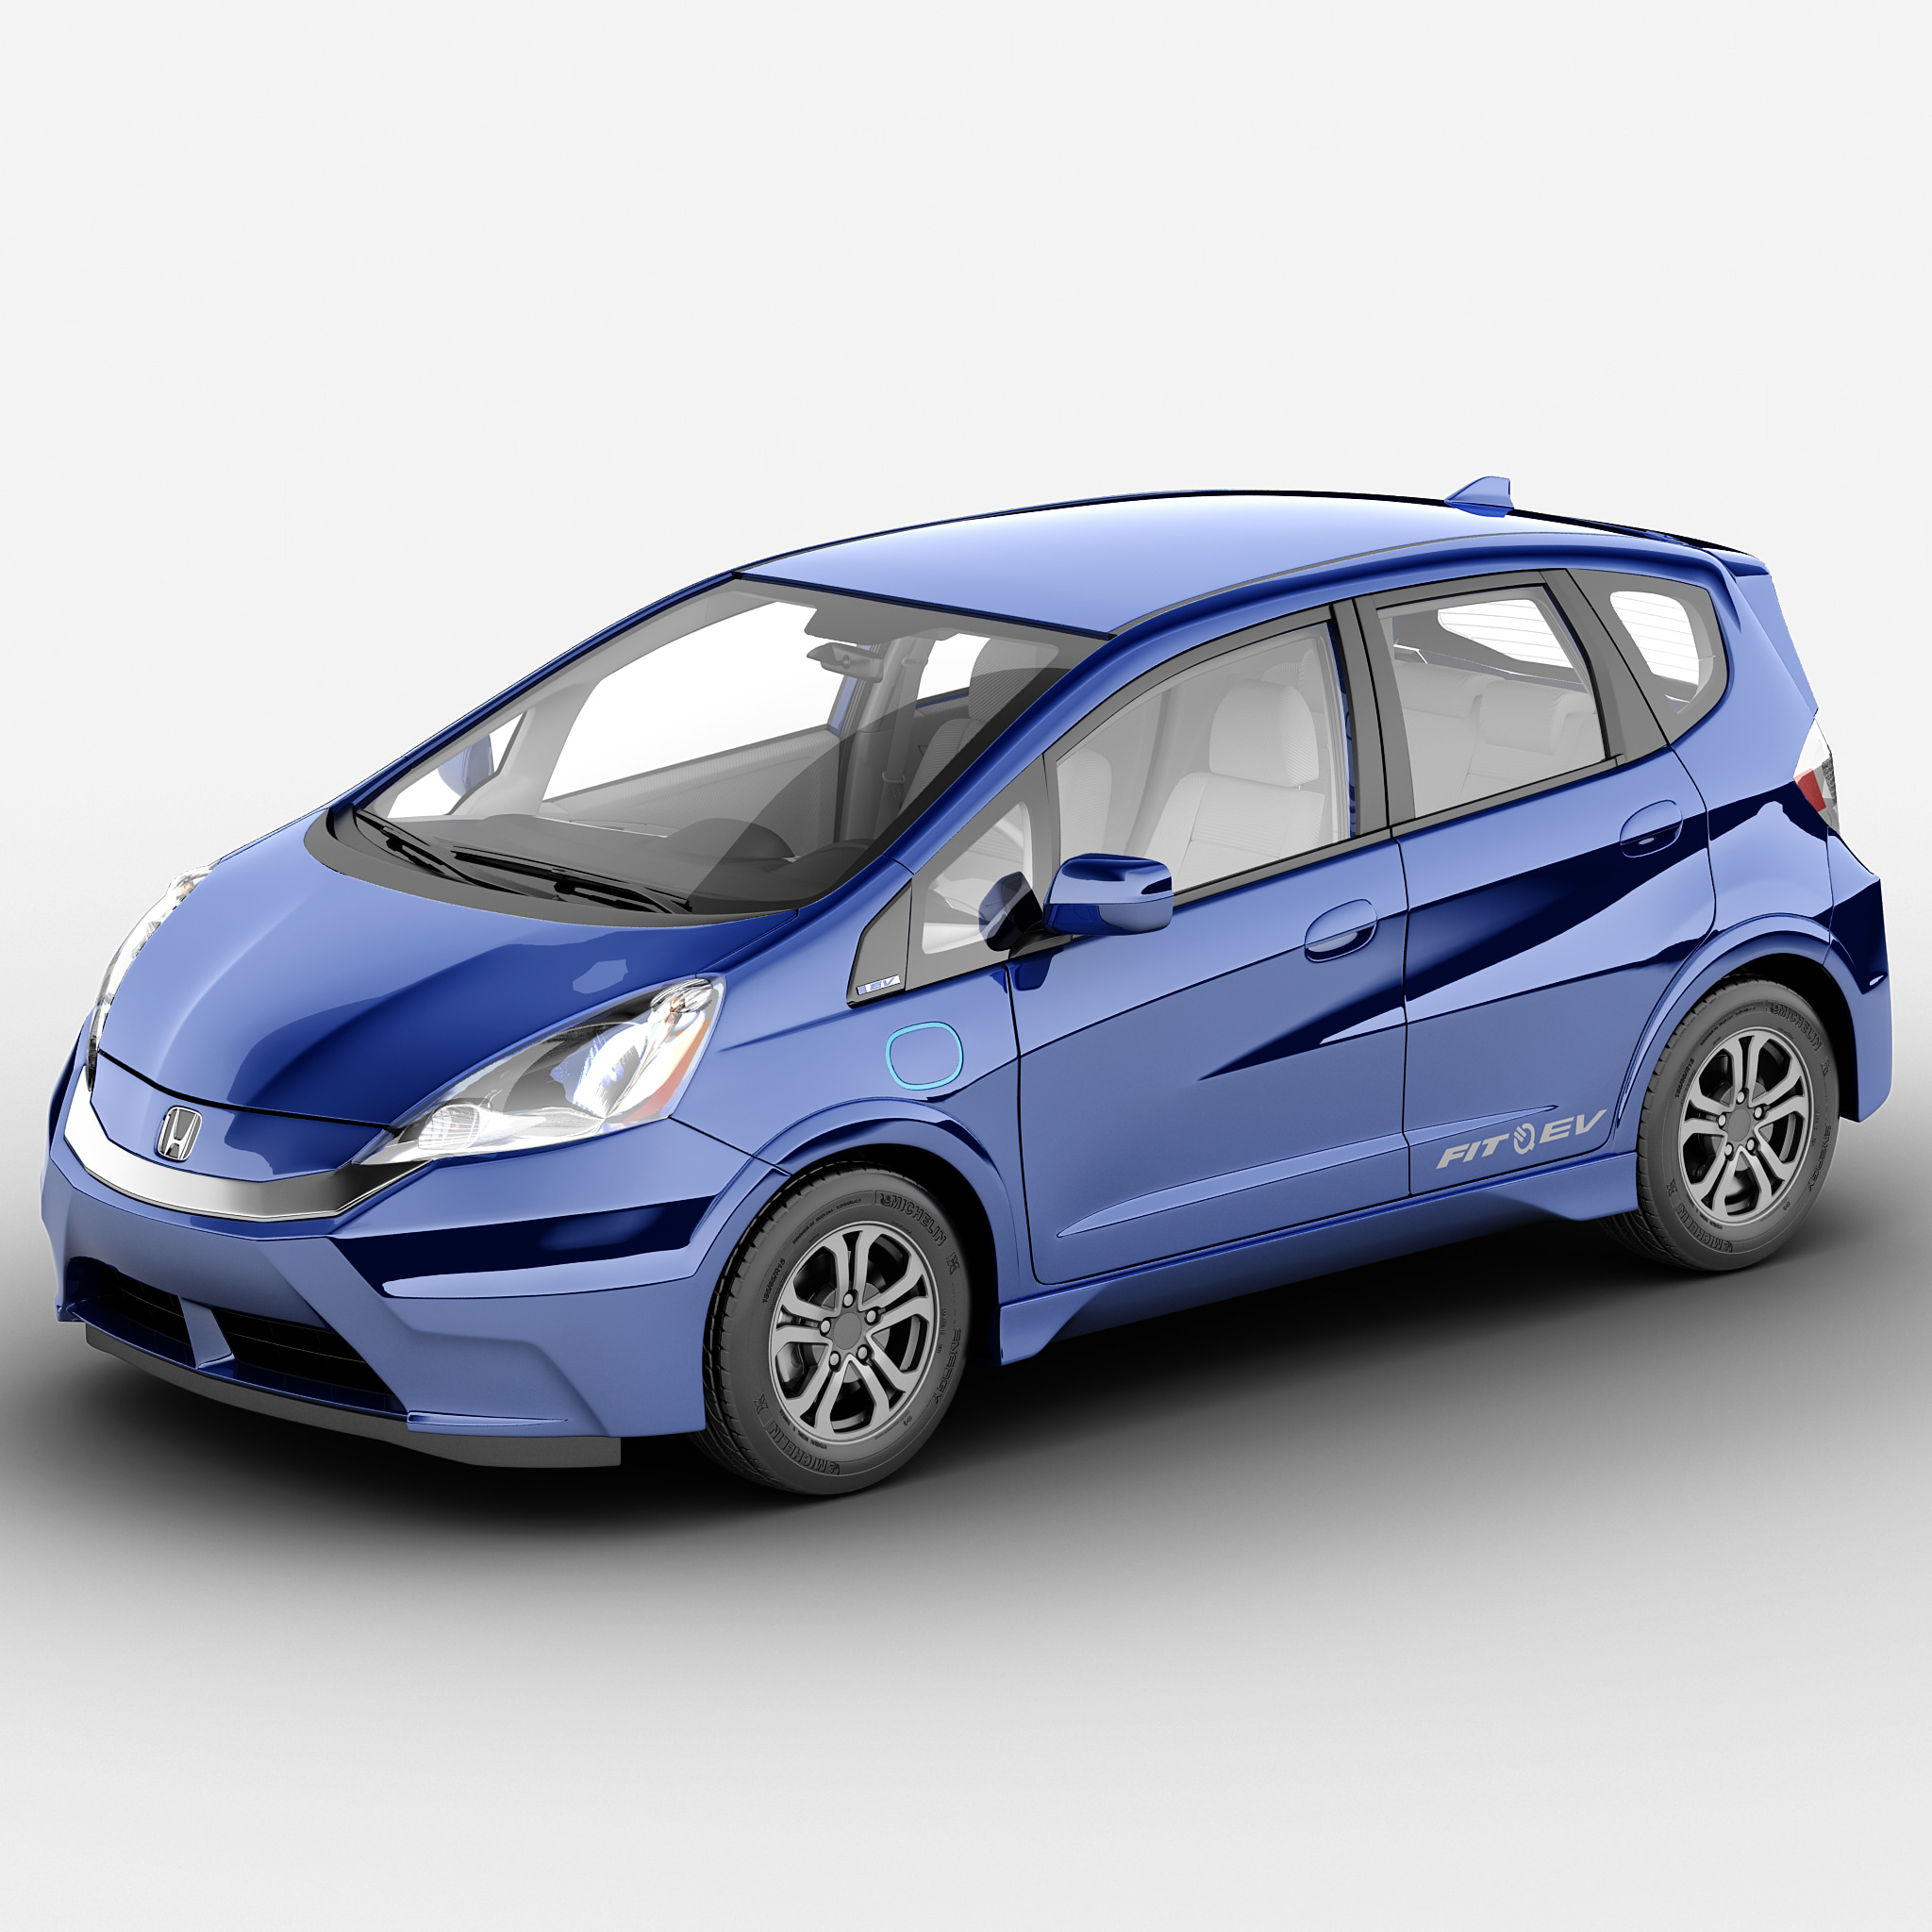 Honda Fit EV 2013_2.jpg